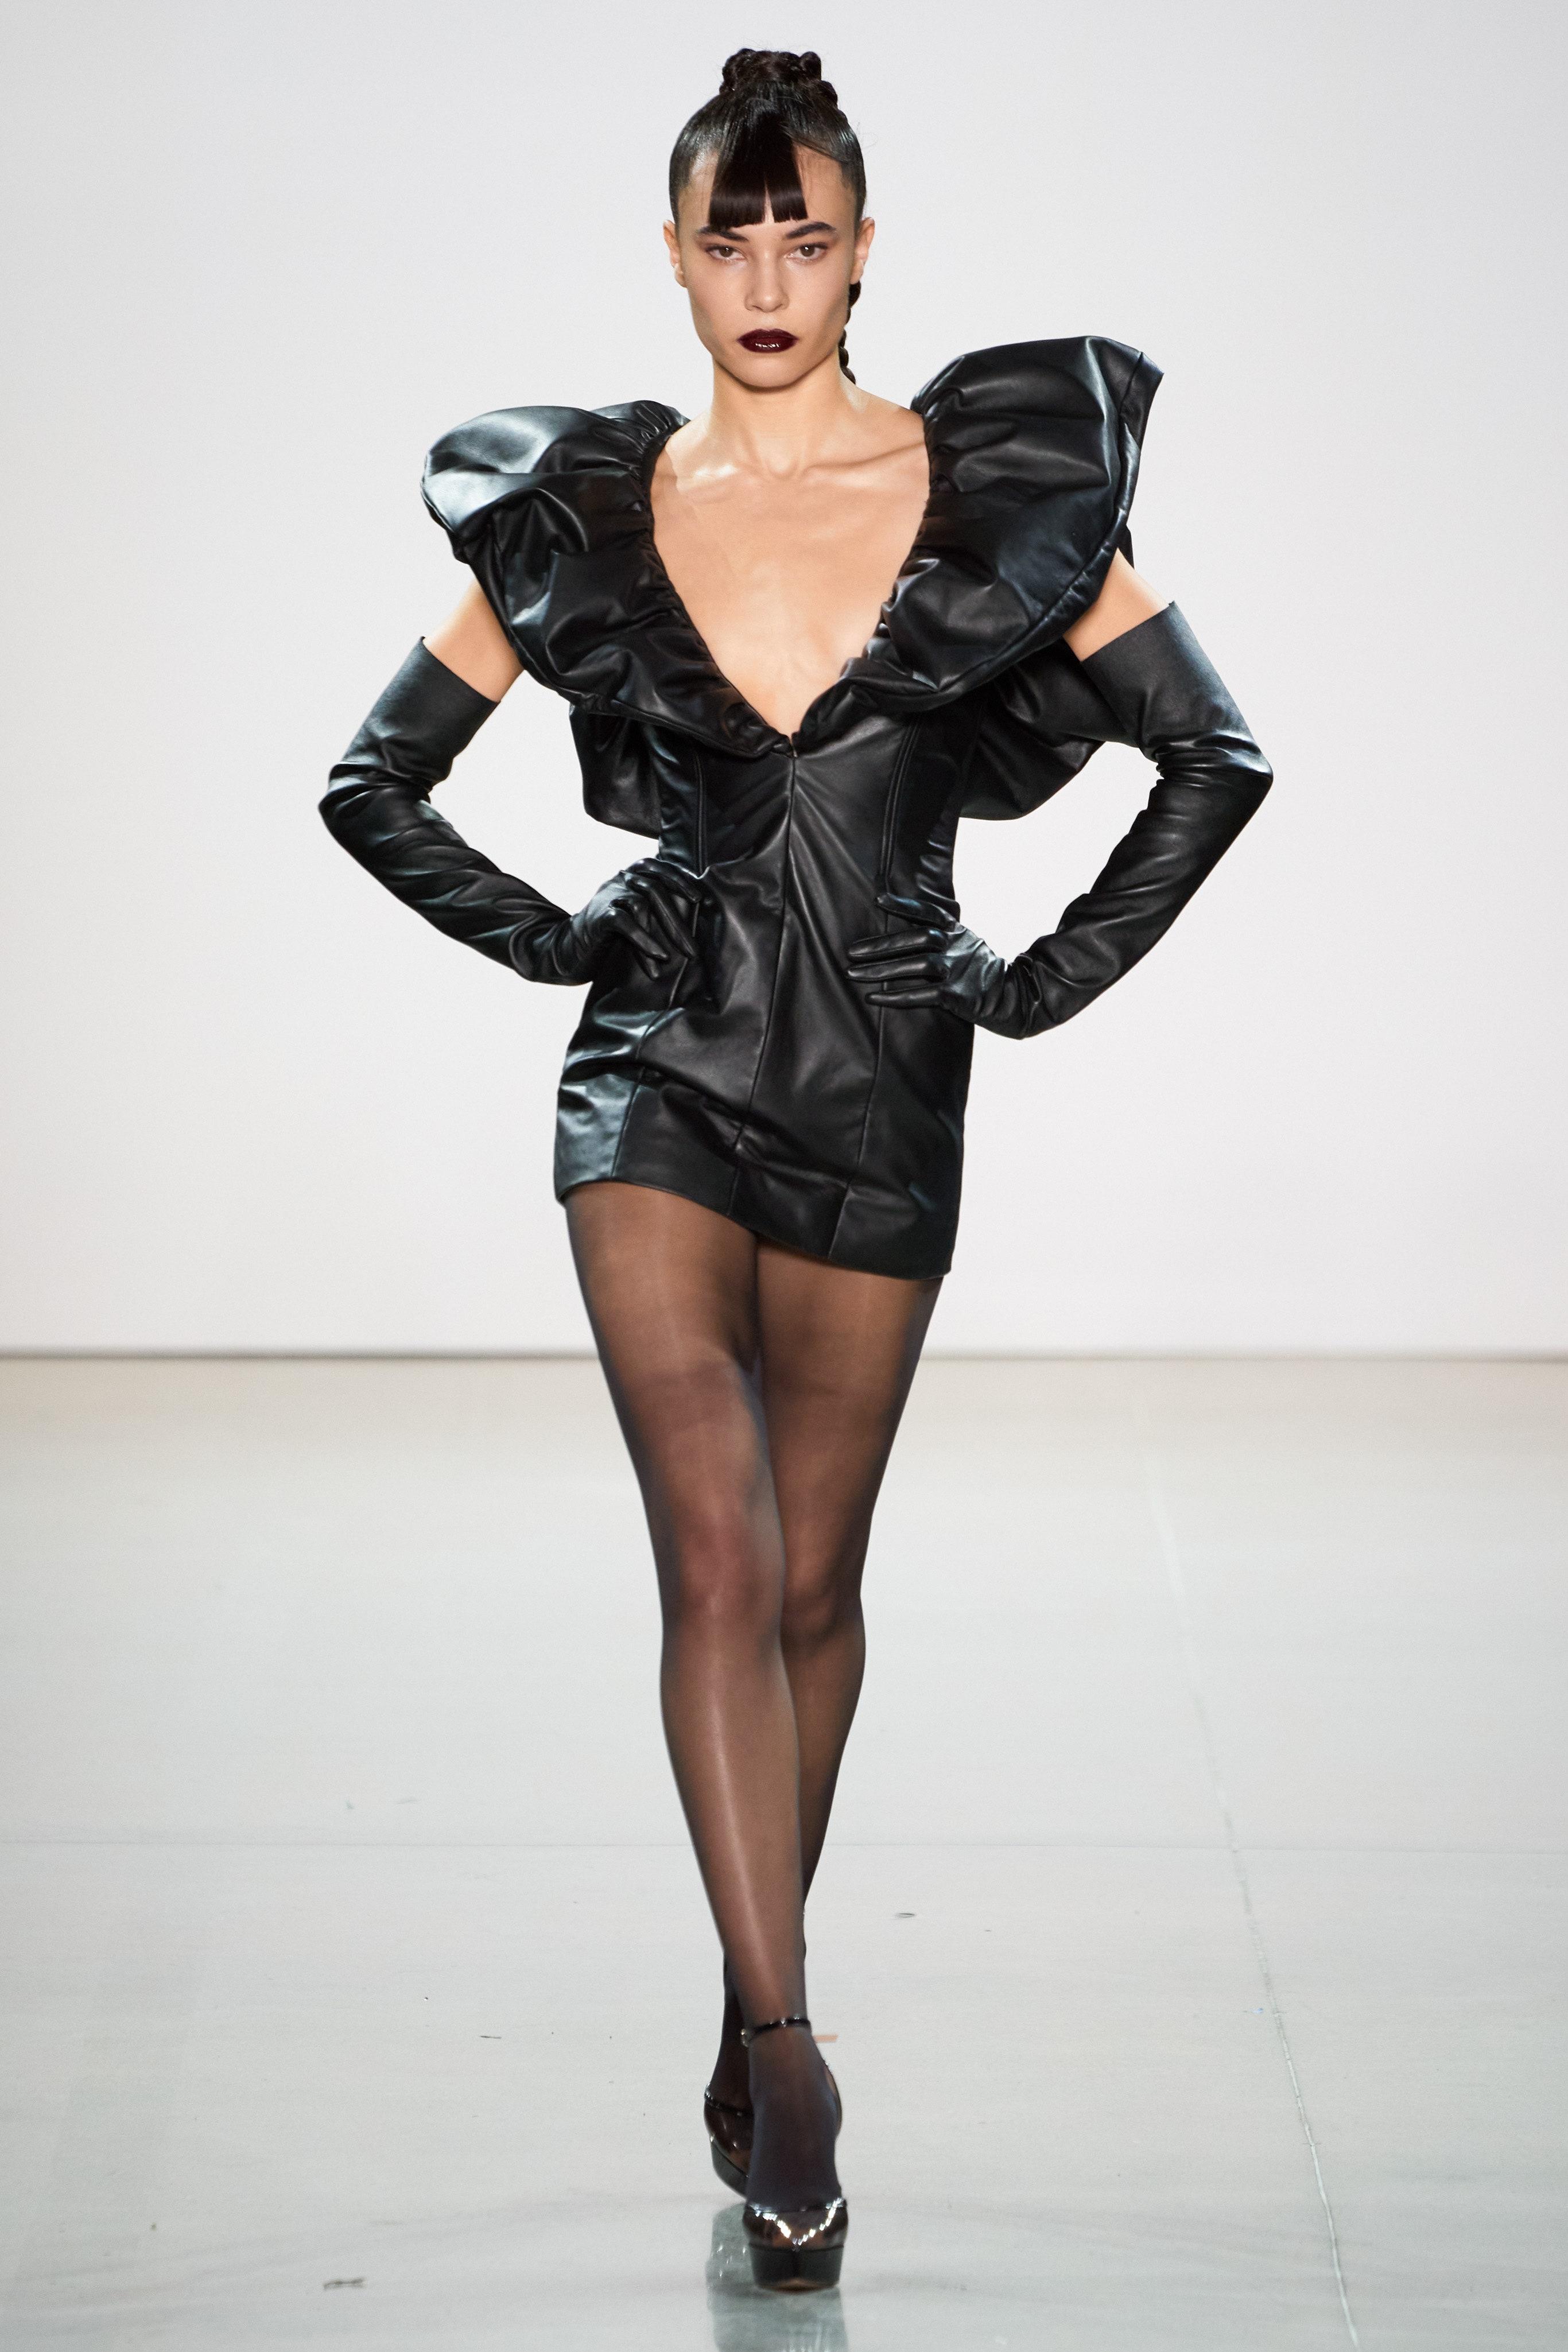 LeQuan Smith Fall 2020 dress Photo Daniele Oberauch Gorunway com